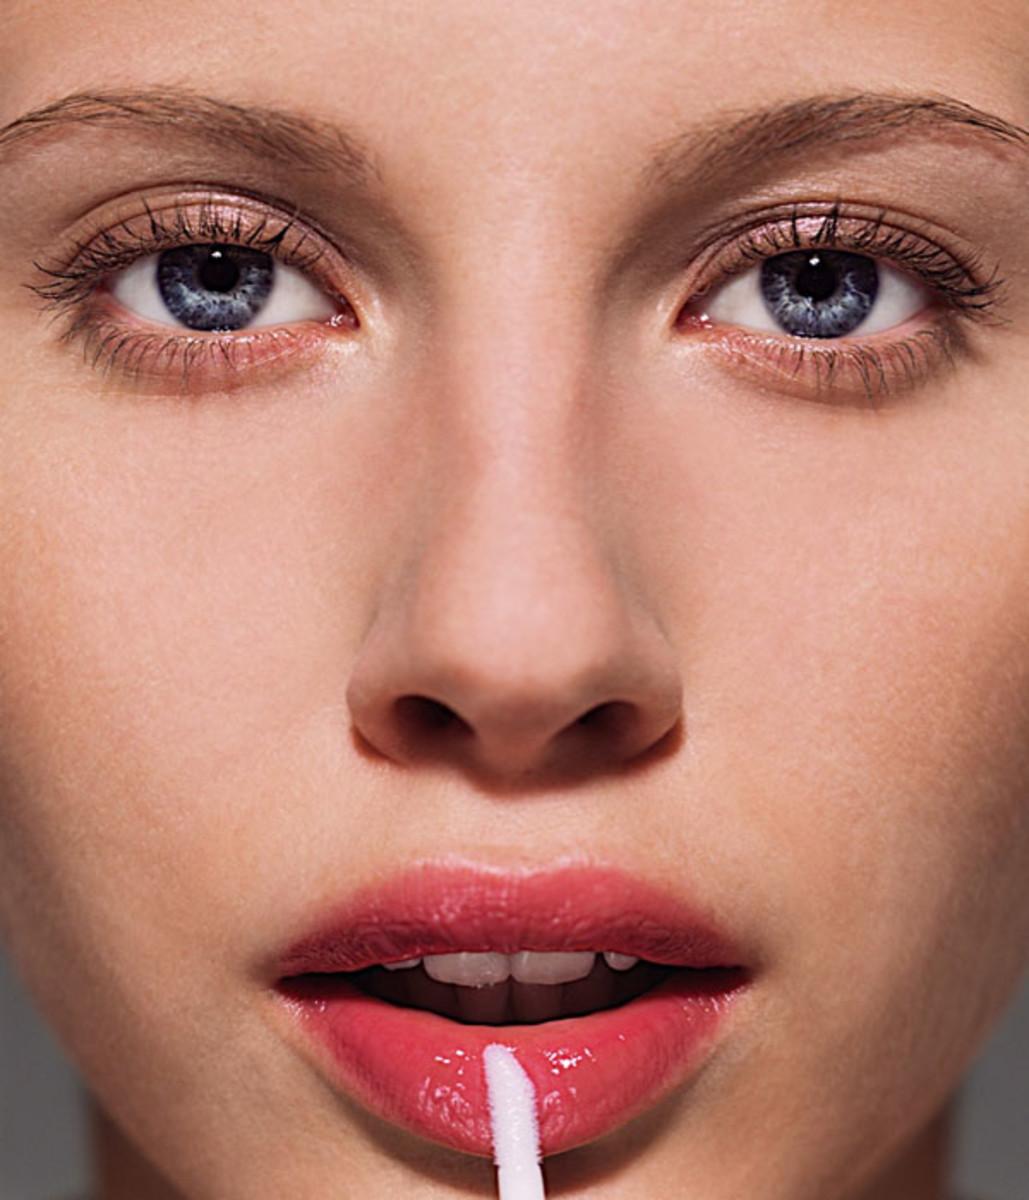 woman-applying-lip-gloss